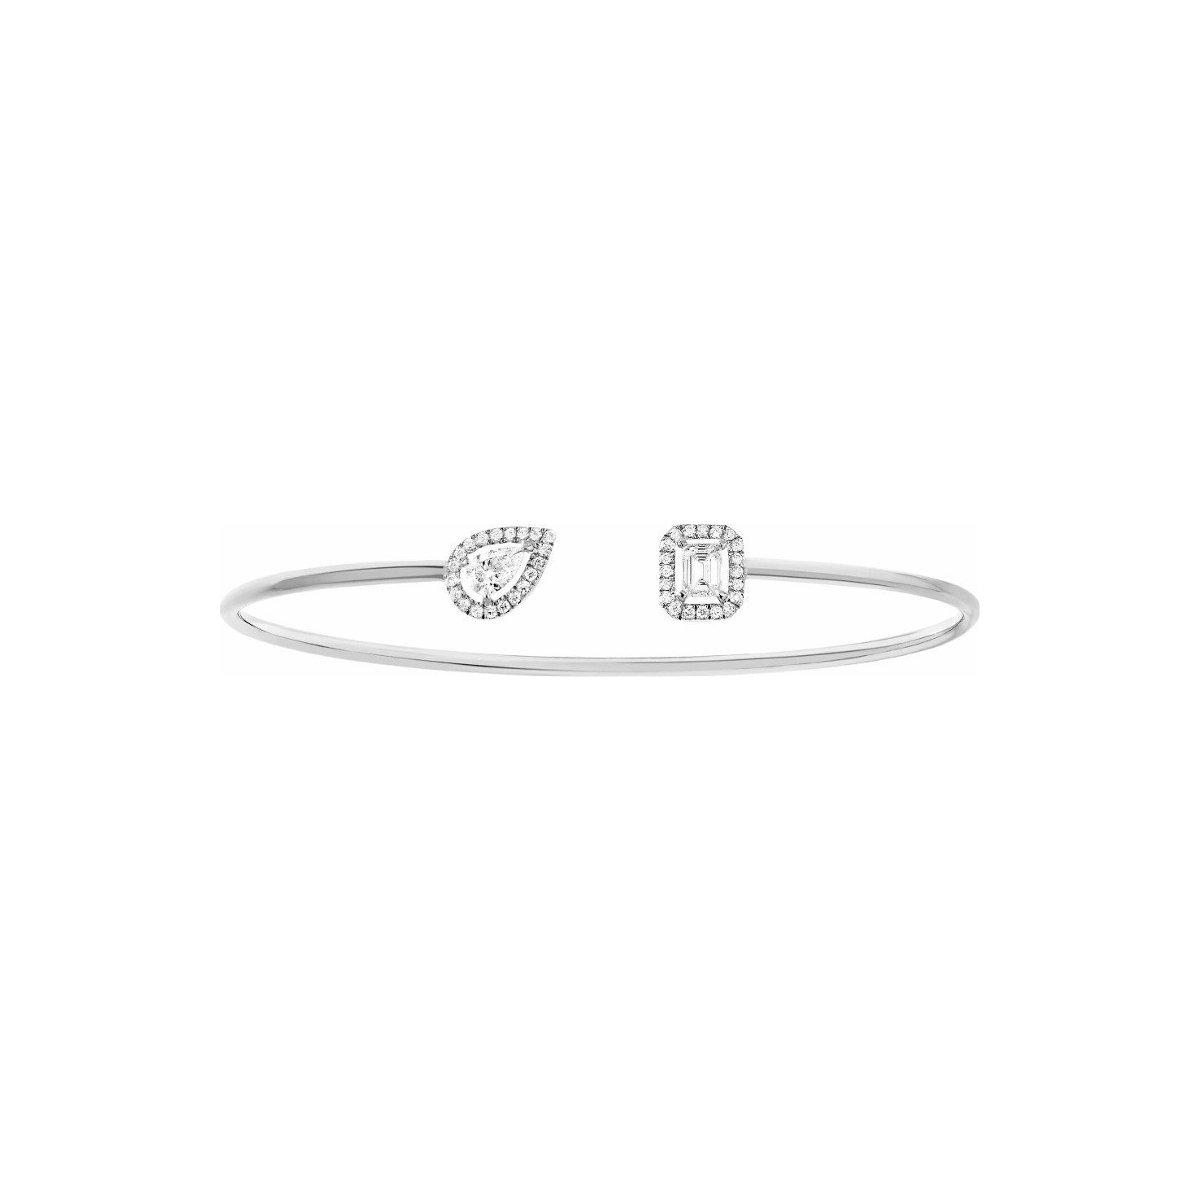 Bracelet jonc Messika My Twin Toi & Moi en or blanc et diamants vue 1